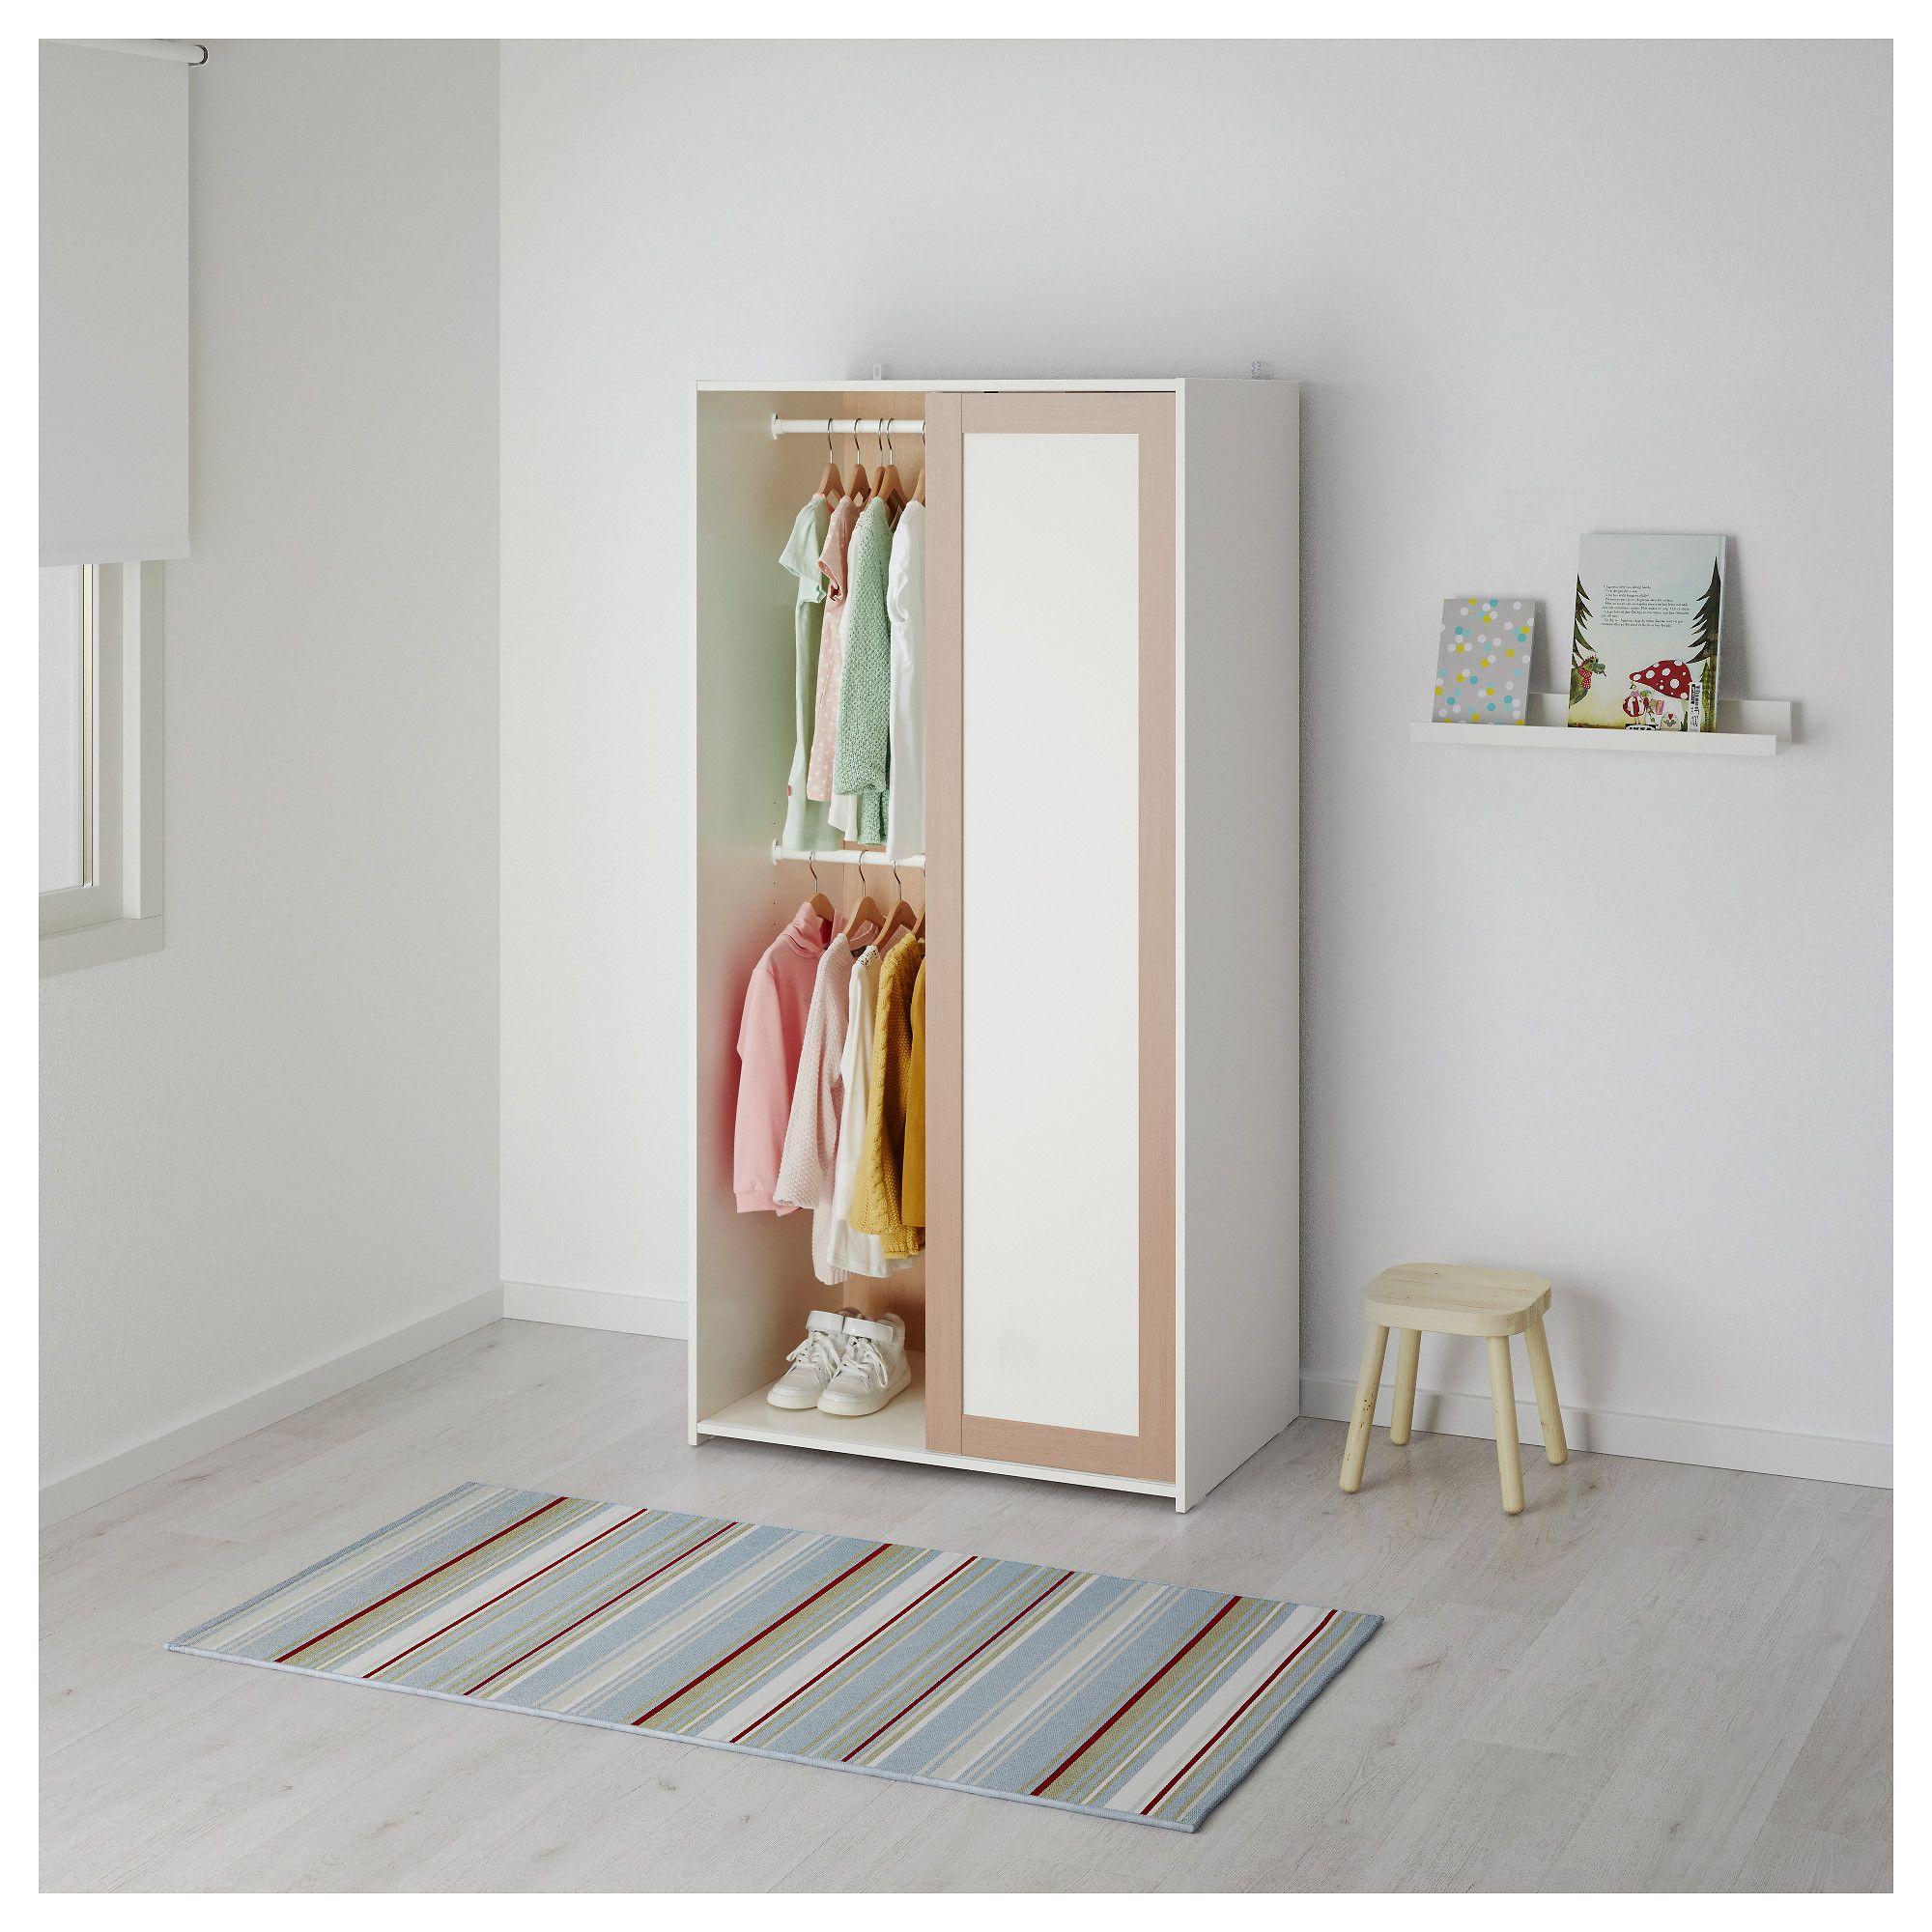 Fresh Home Furnishing Ideas And Affordable Furniture Ikea Kids Wardrobe Childrens Storage Furniture Affordable Furniture